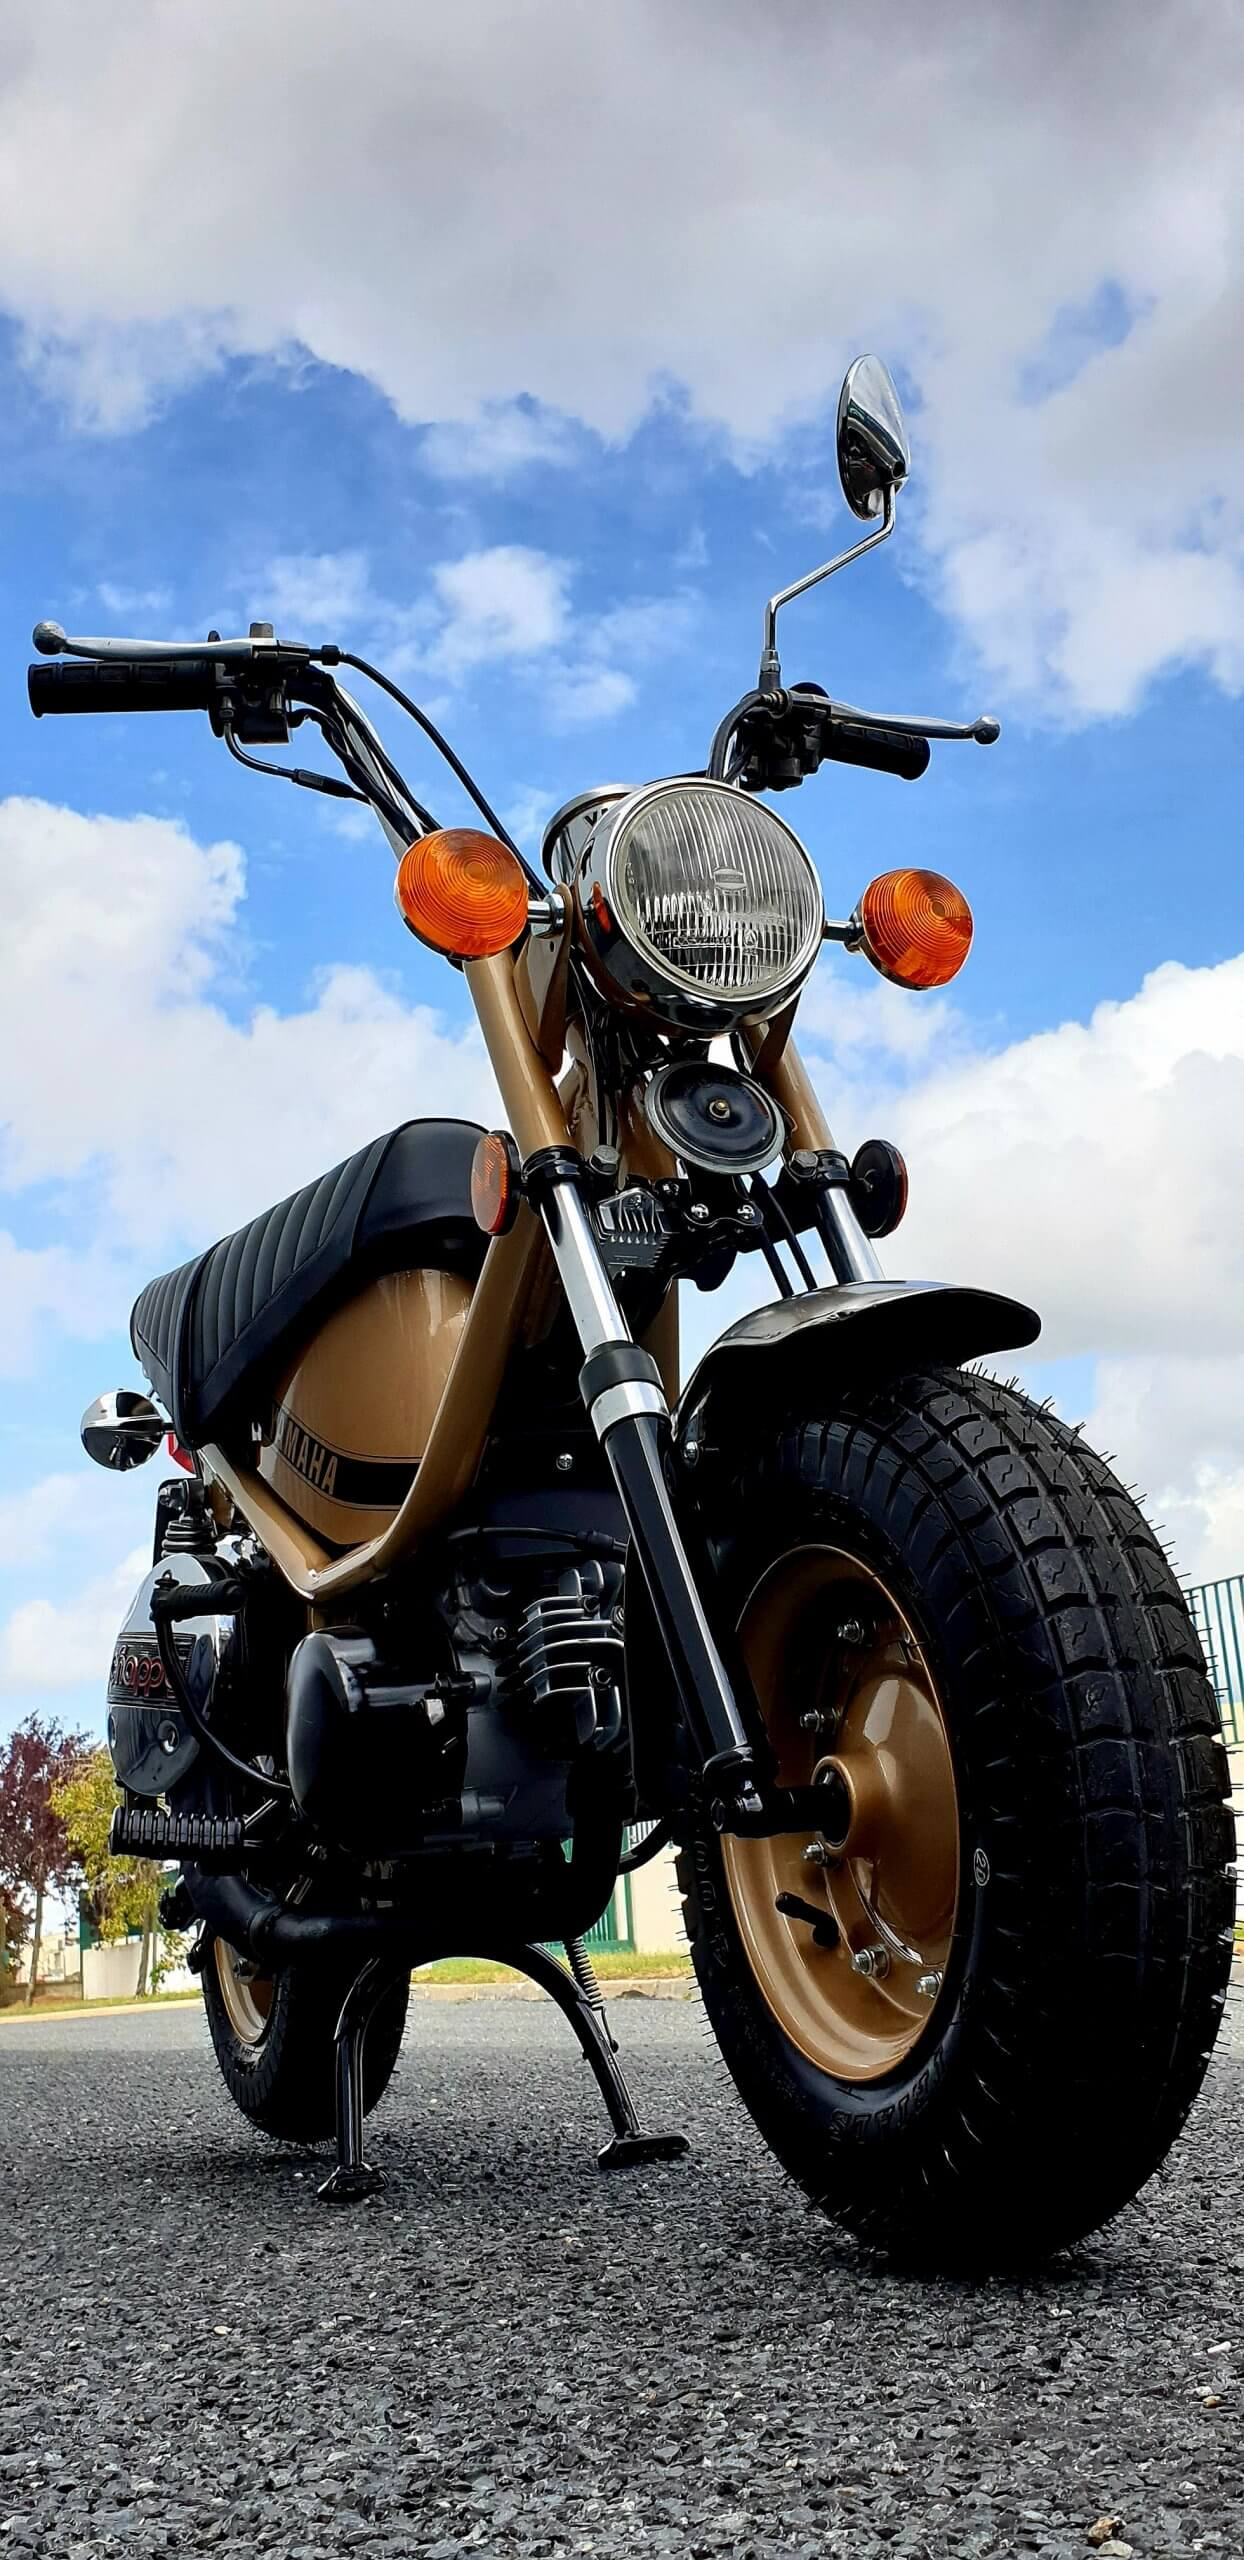 Restauration Moto Vintage Yamaha Chappy - Happy Chappy - Eightie style